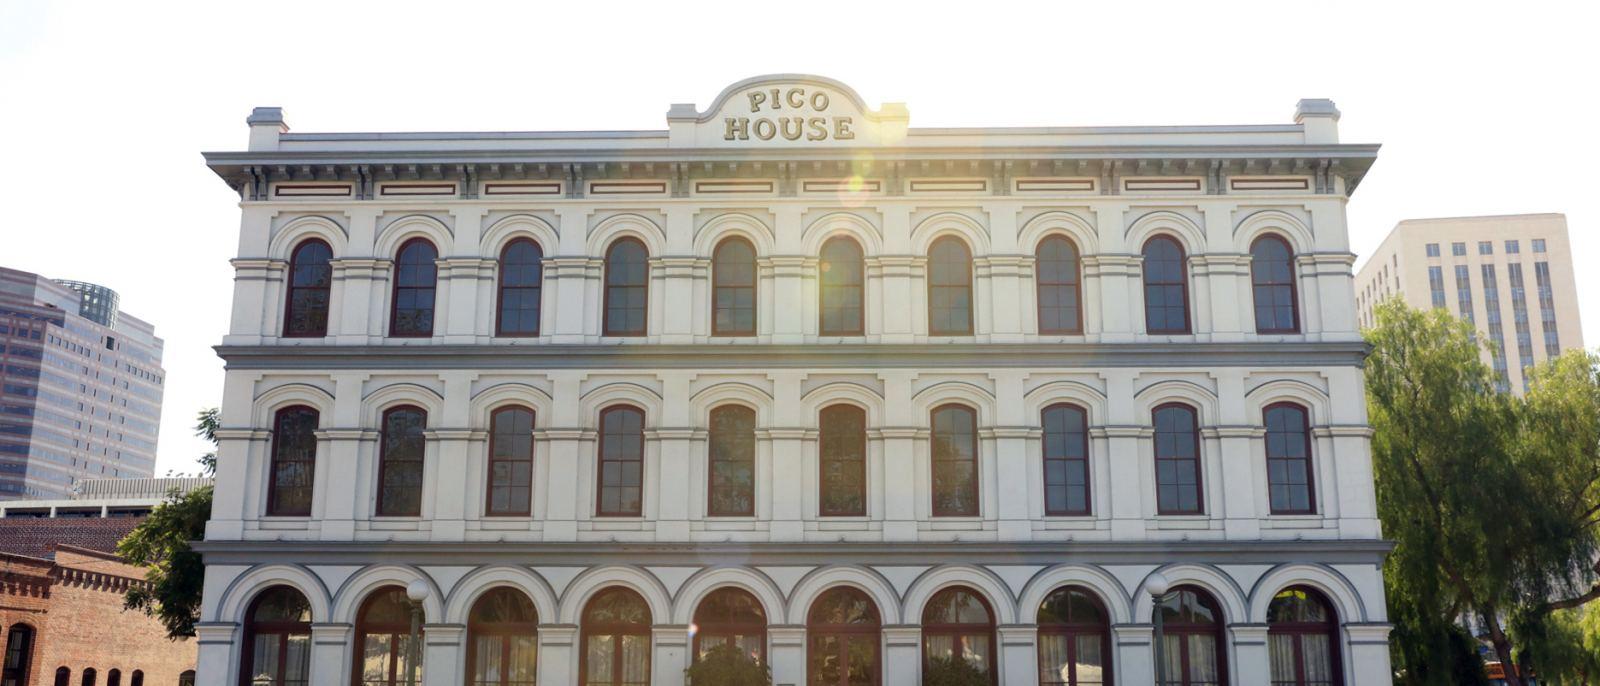 Pico House